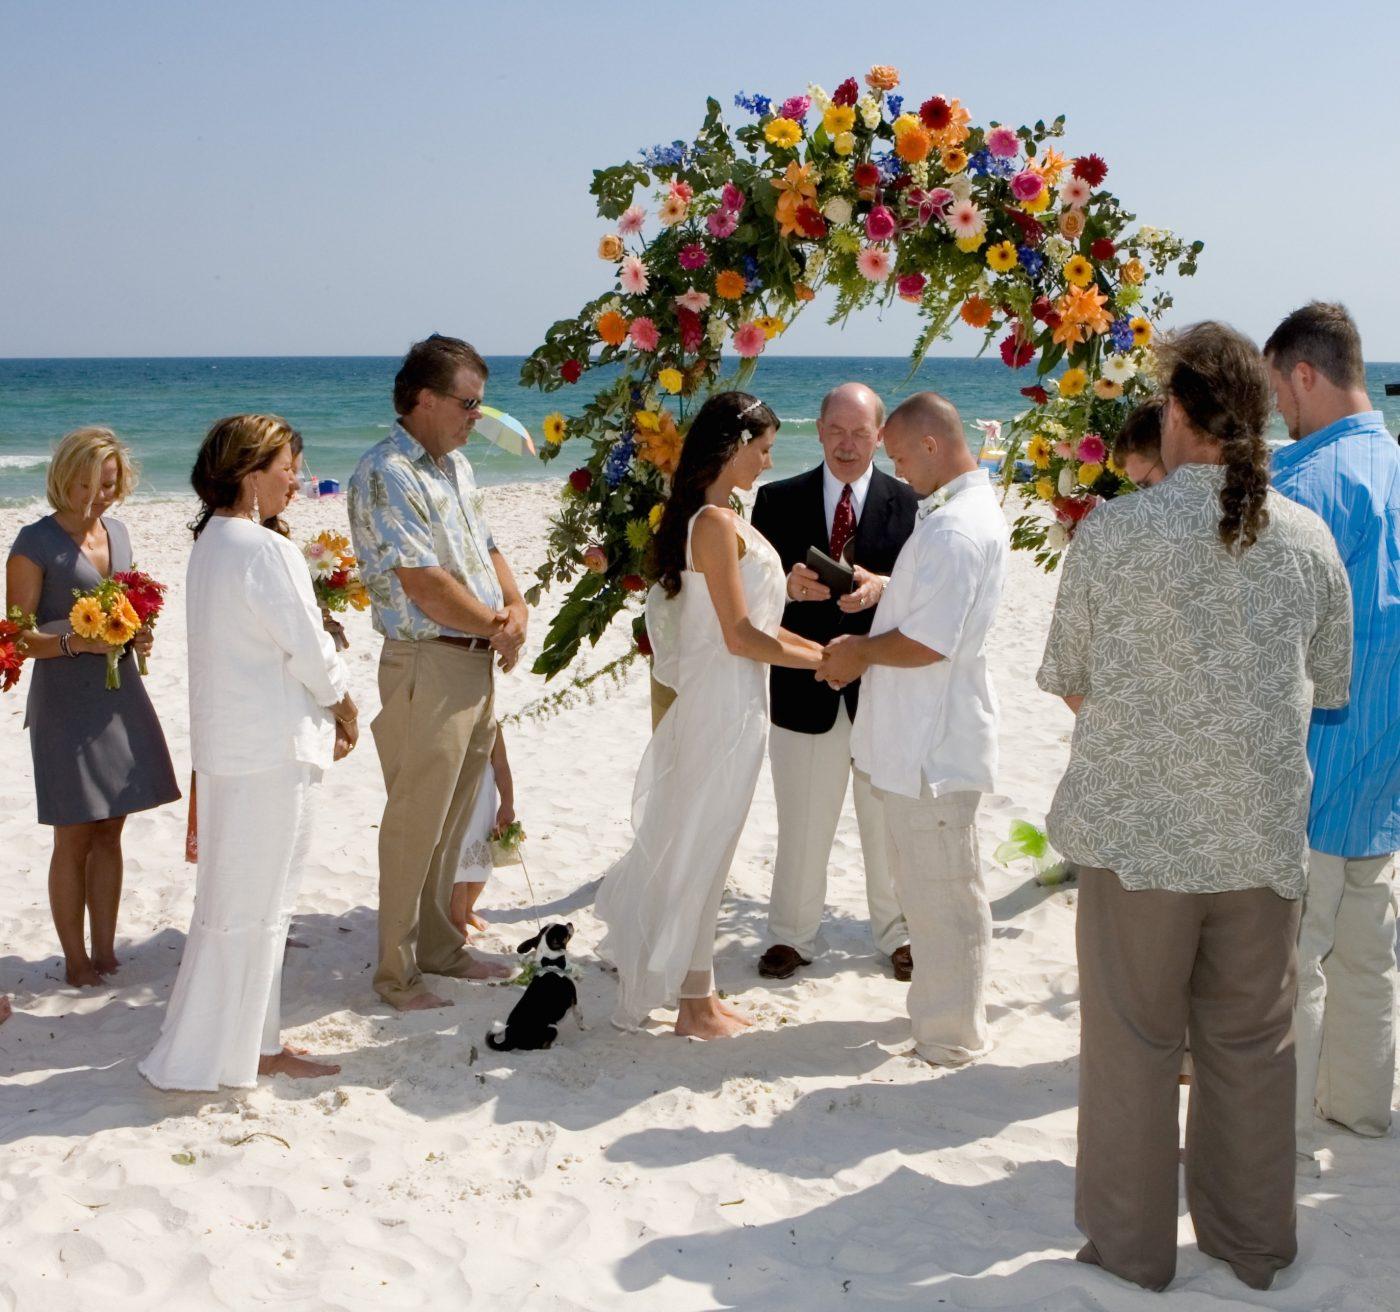 Lovely beach wedding